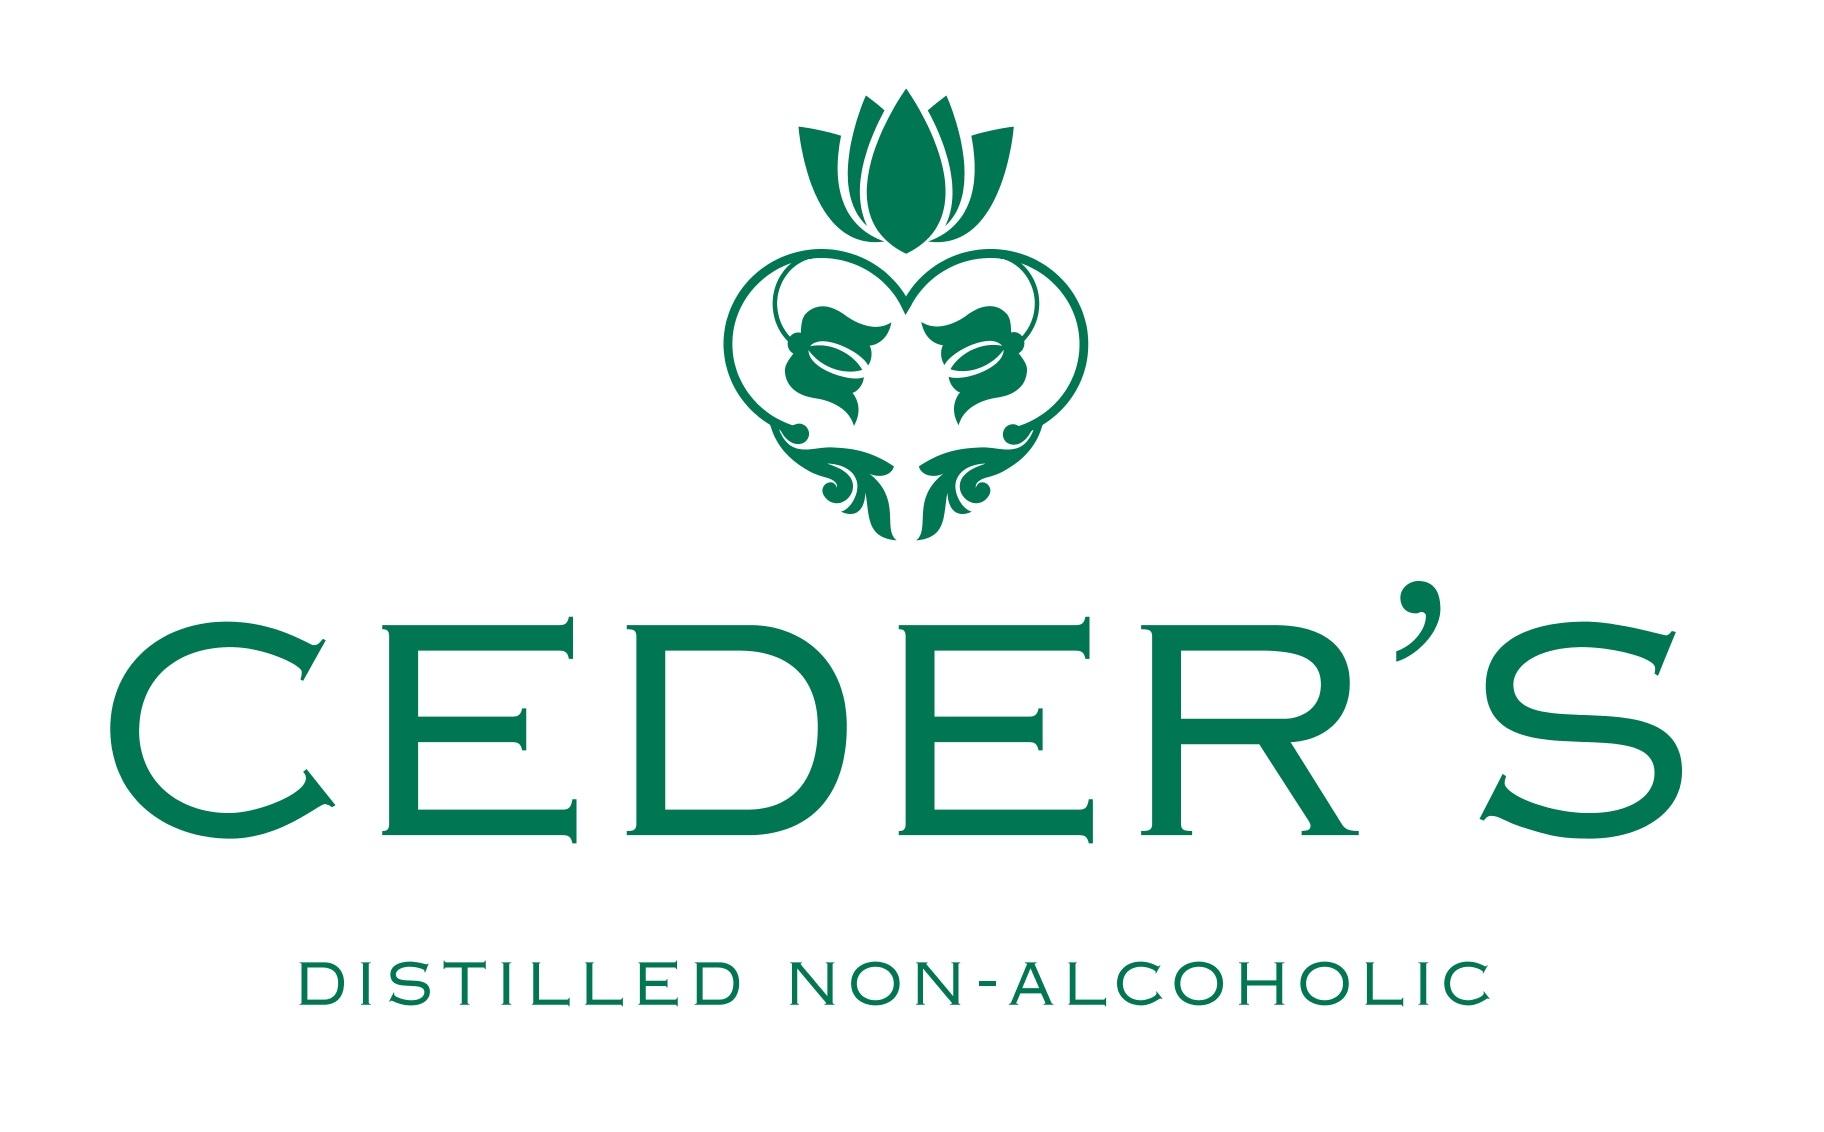 CEDER'S logo